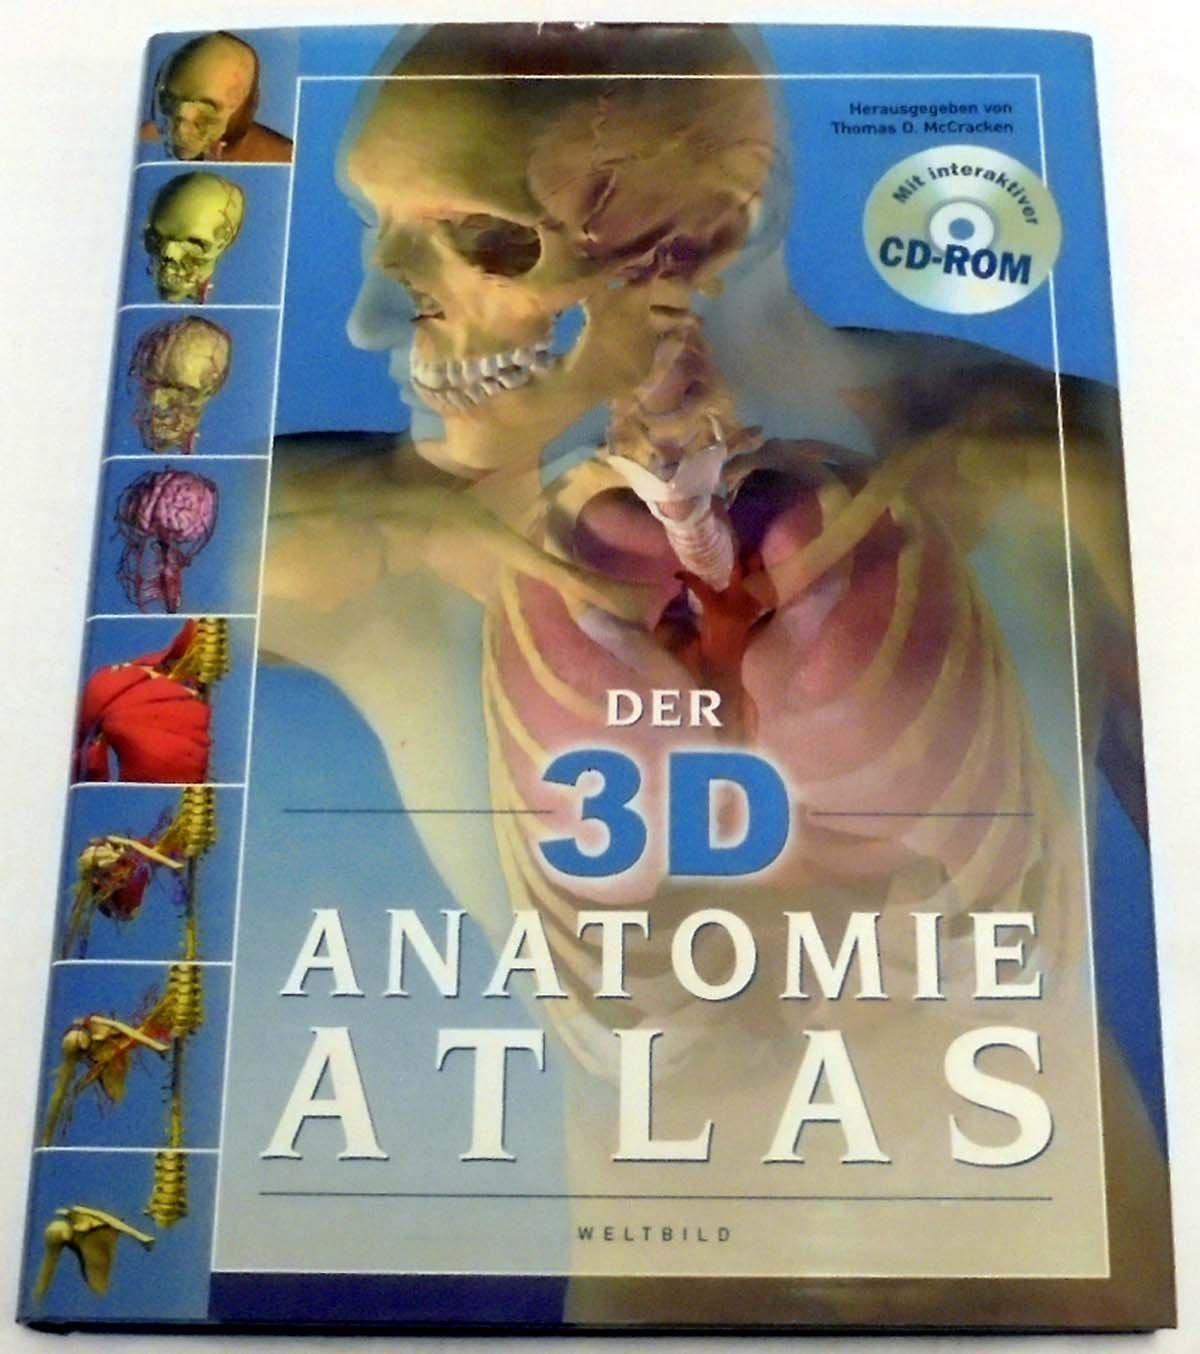 Der 3D-Anatomie-Atlas : Amazon.de: Bücher